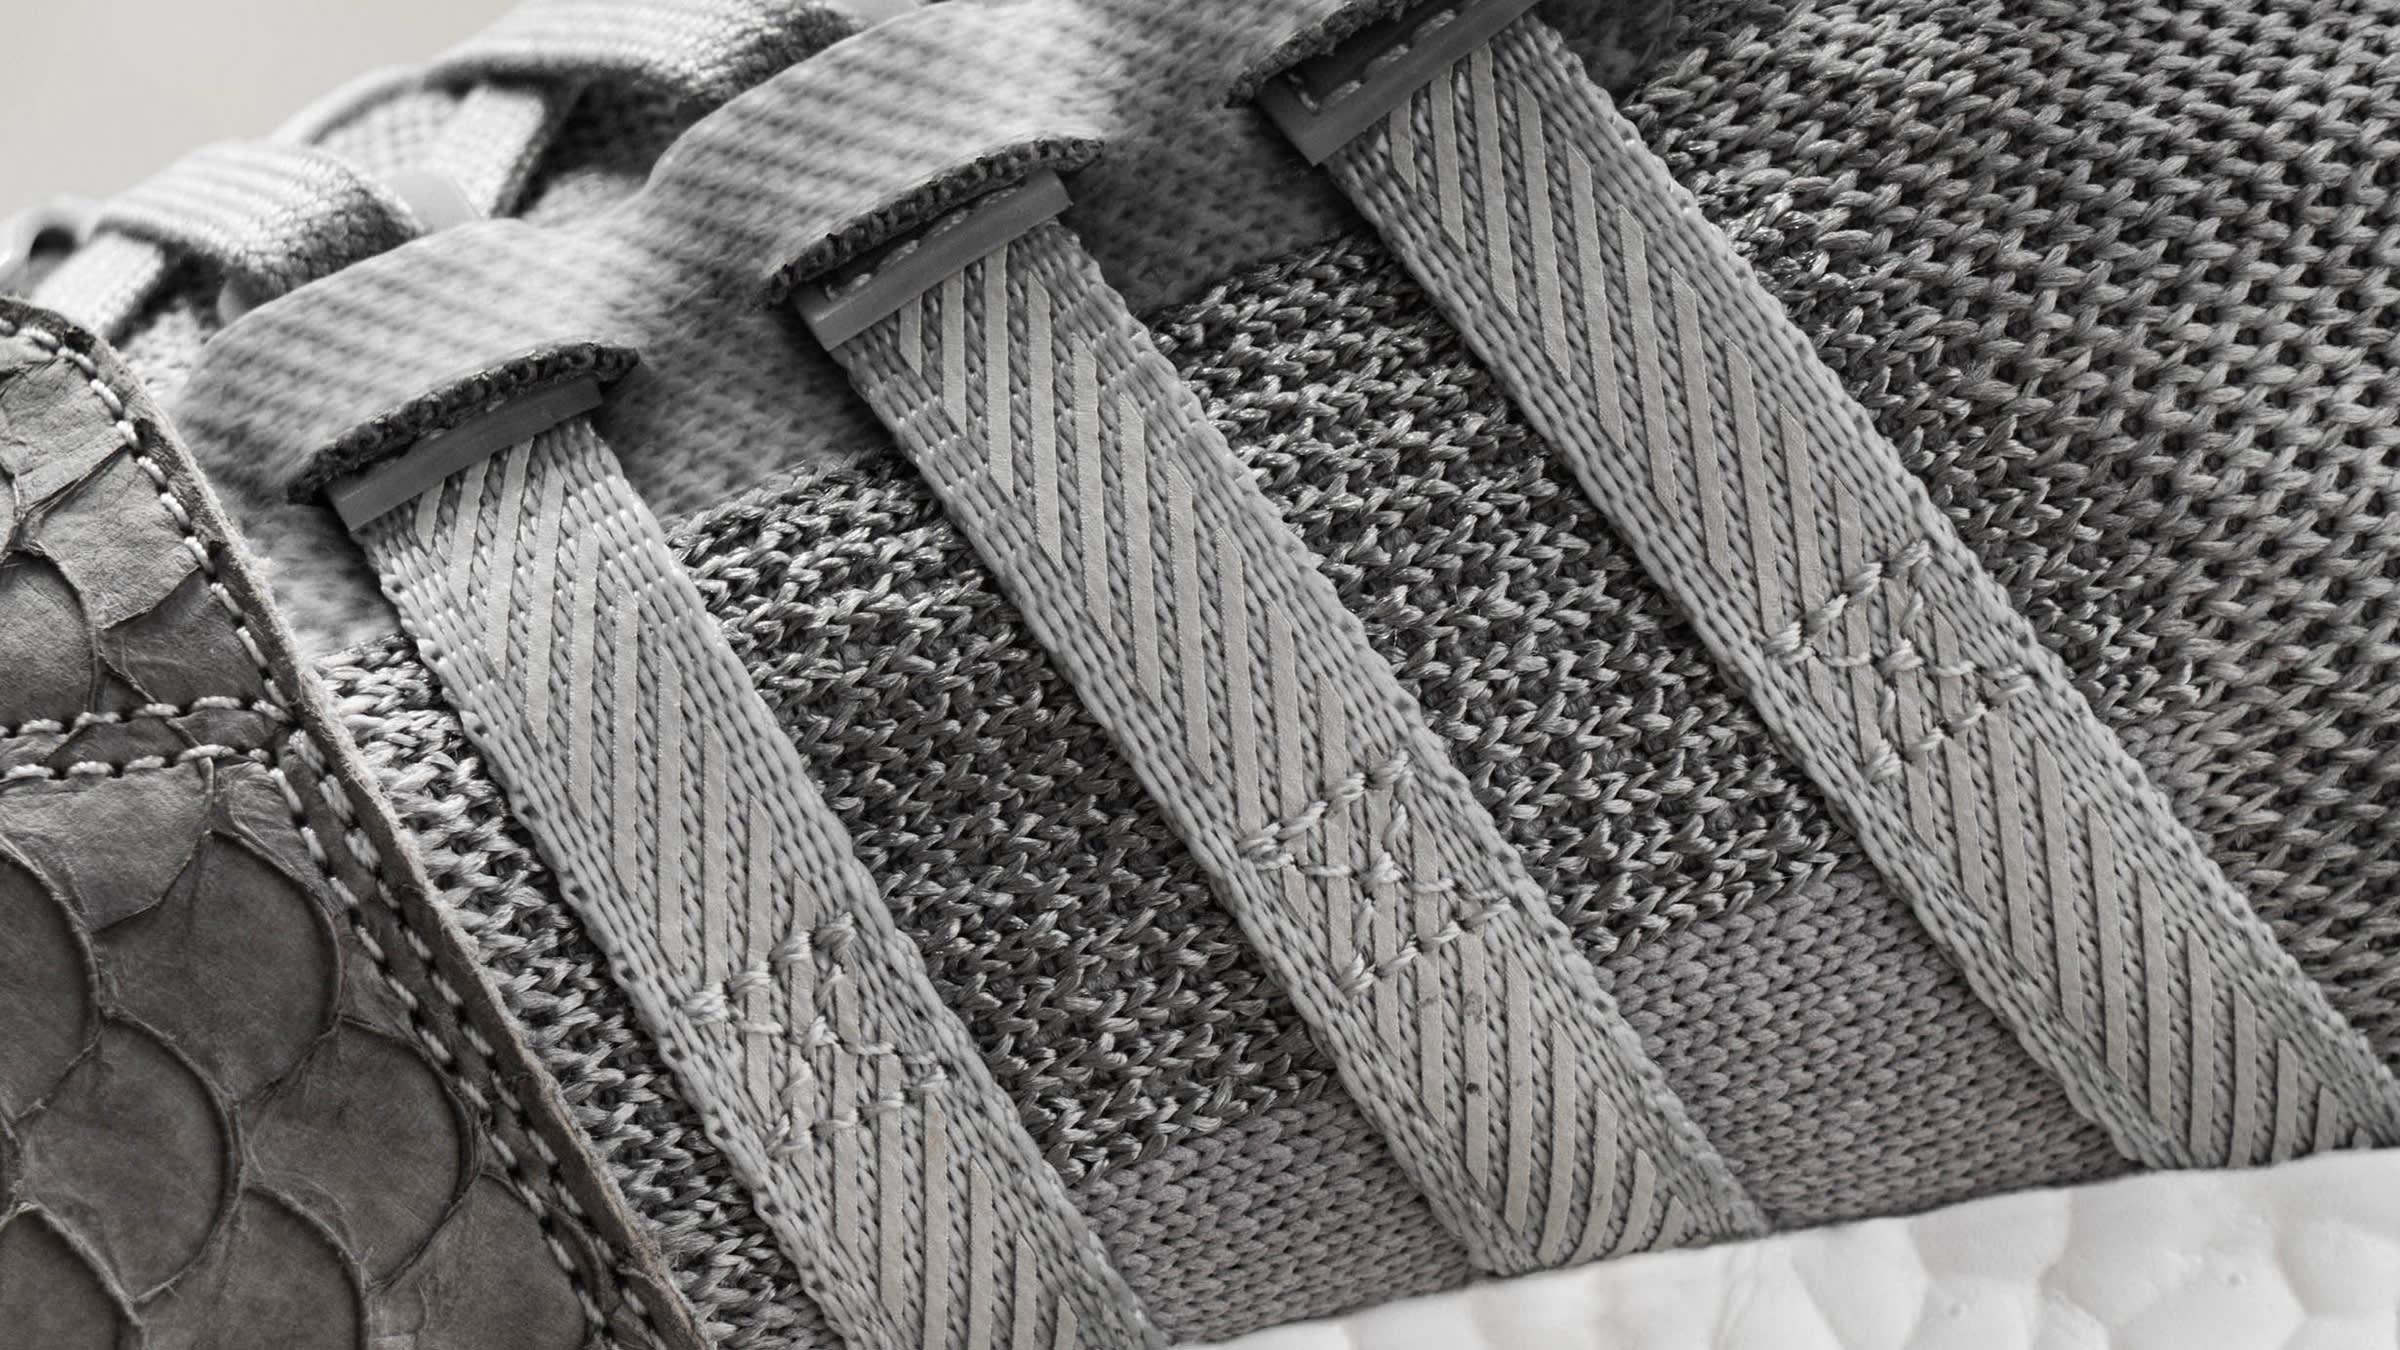 49a2bb13b4a Adidas x Pusha T EQT Support Ultra PK  King Push  Stone